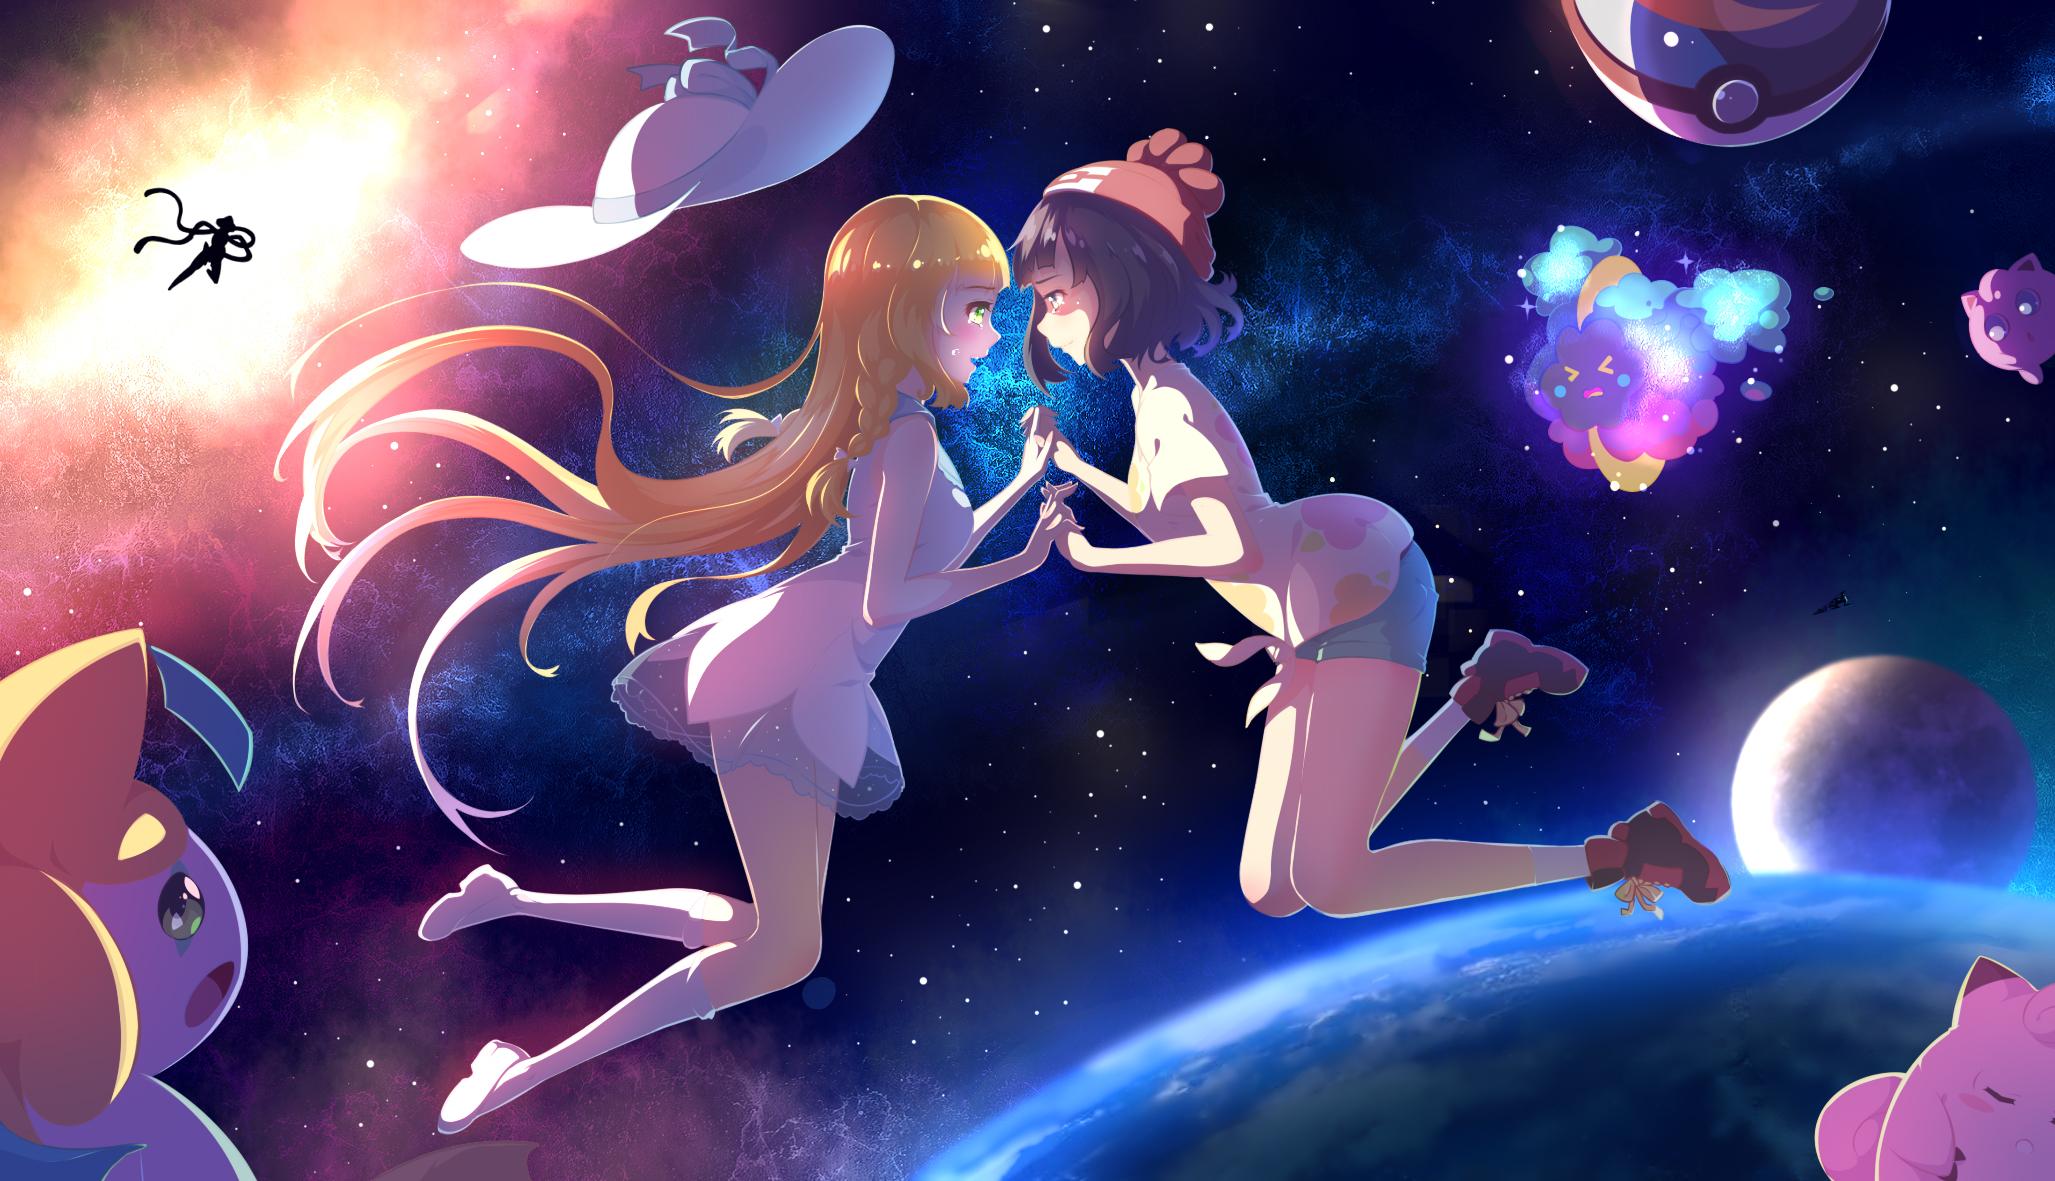 Pokmon Sun and Moon HD Wallpaper Background Image 2055x1181 2055x1181